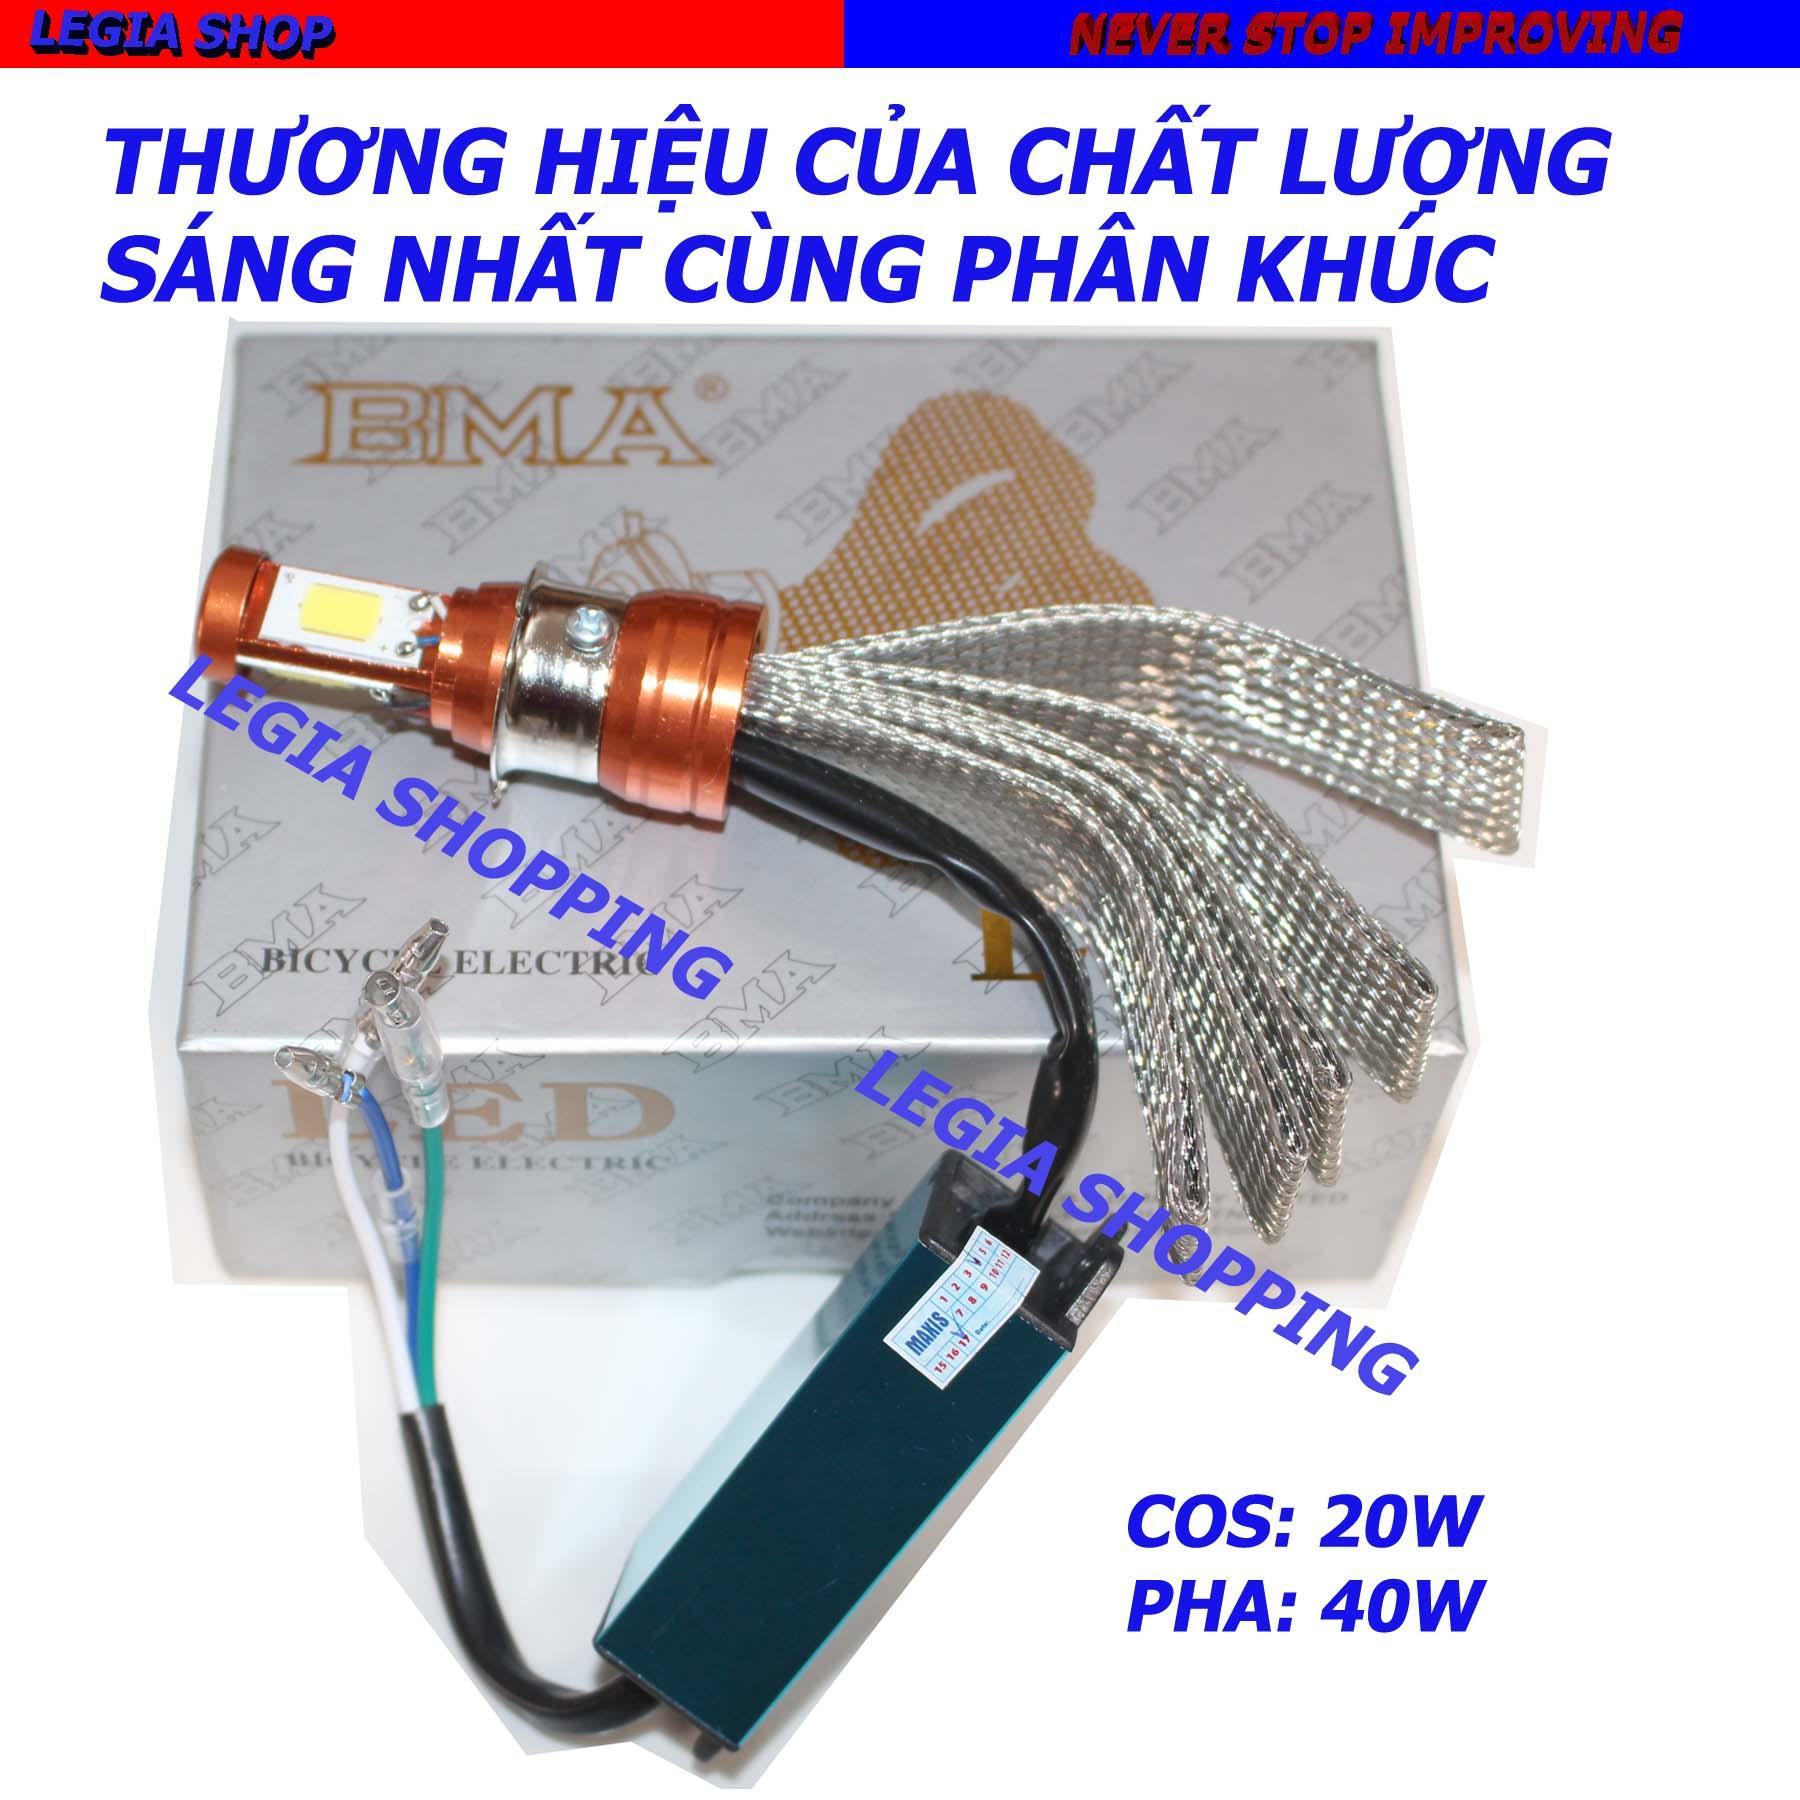 Mua Đen Pha Led Hiệu Bma 40W Chan M5 Gắn Xe Dream Wave Thai Wave I Alpha Viva Su Sport Bảo Hanh 3 Thang Bma